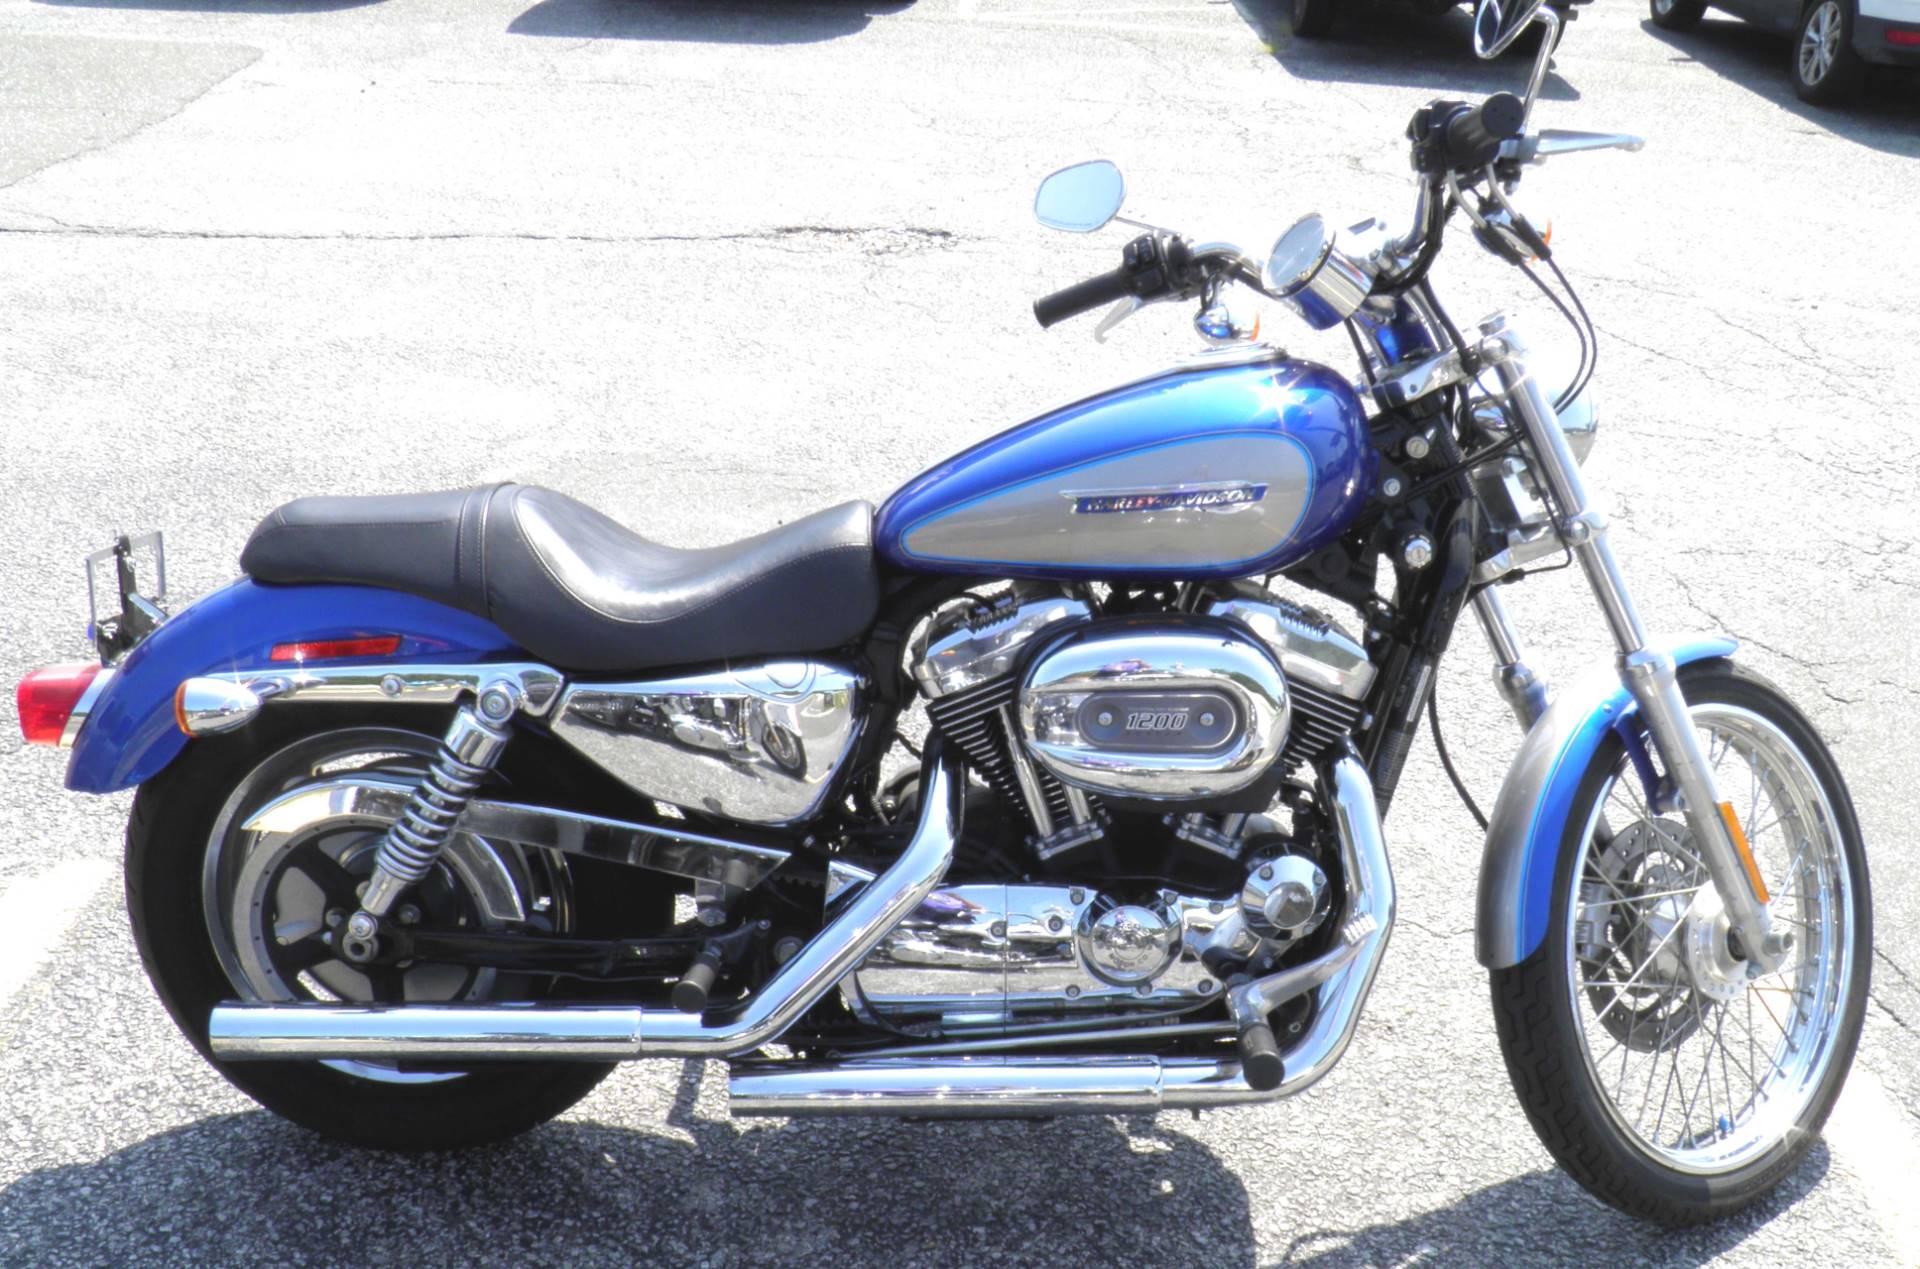 2009 Harley-Davidson Sportster 1200 Custom 2